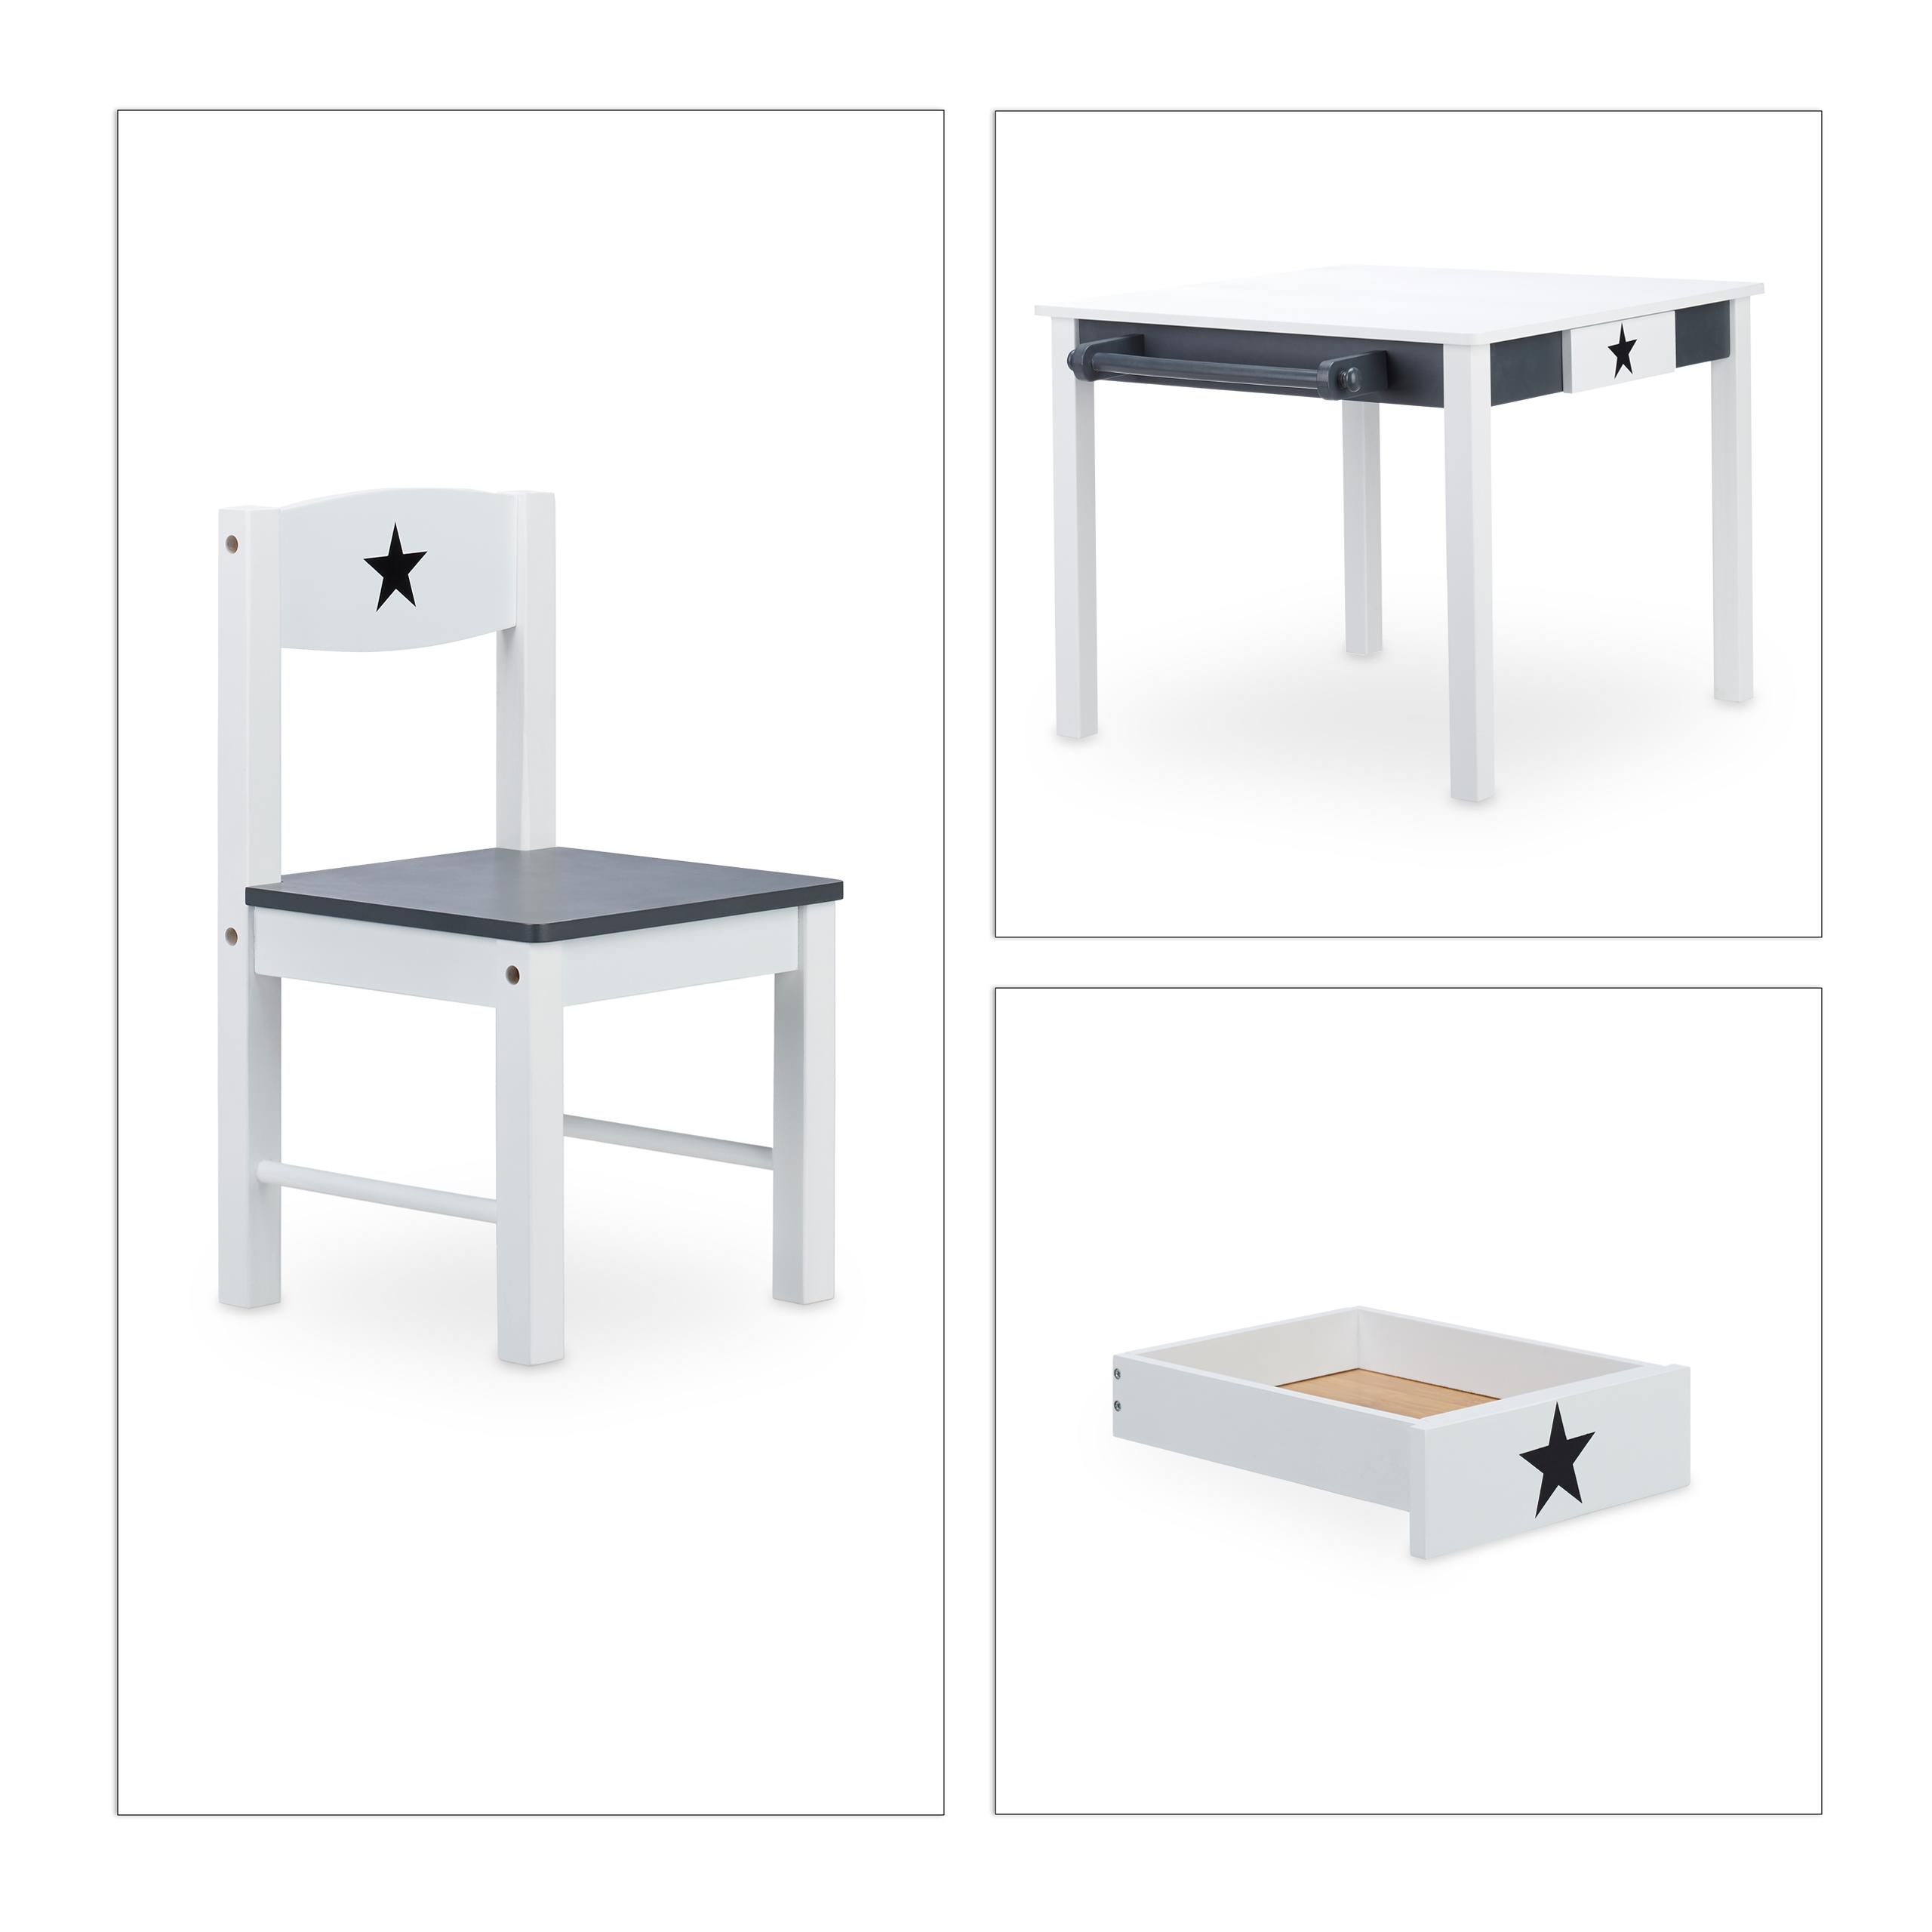 Kindersitzgruppe STAR Holz Kindertisch M Stühlen